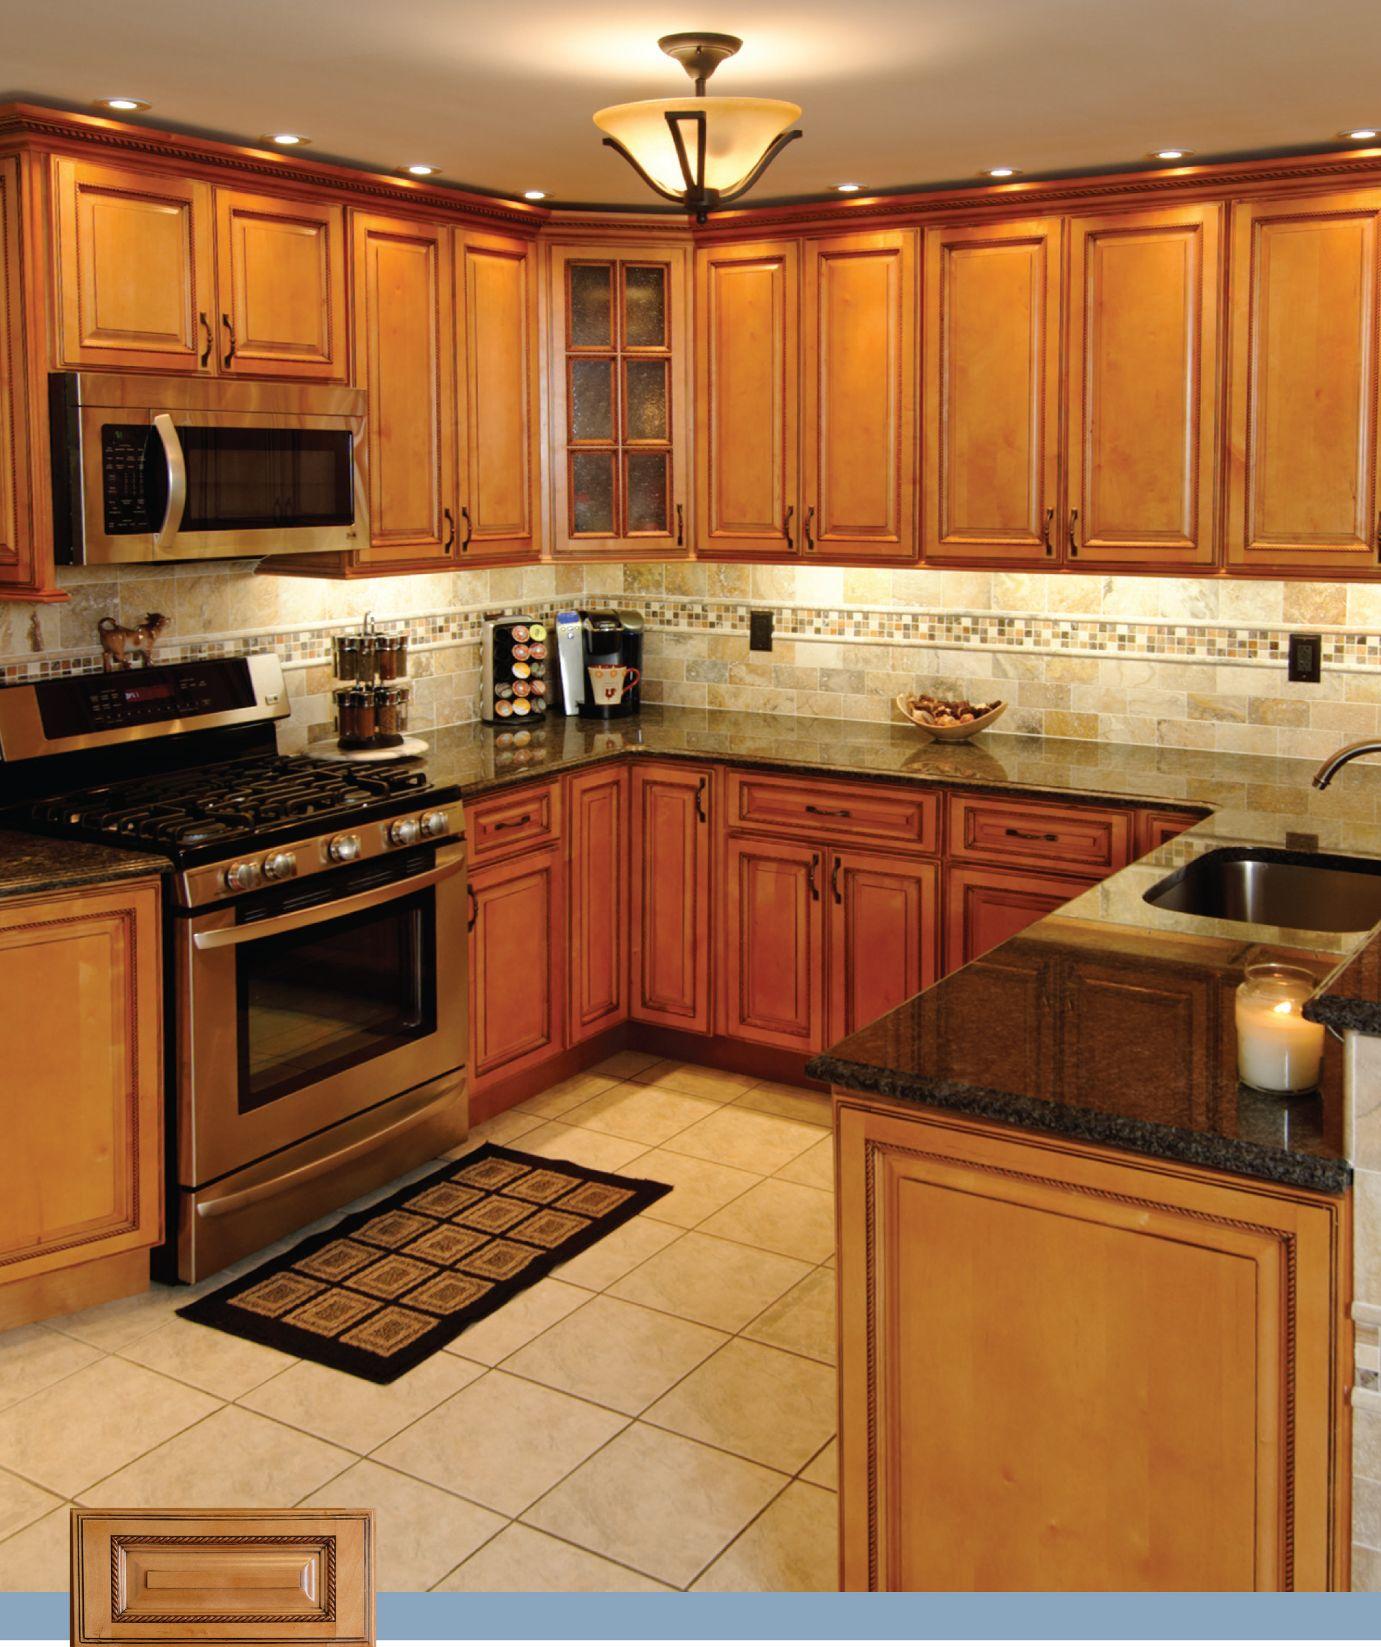 Kitchen cabinet pantry Photo - 1